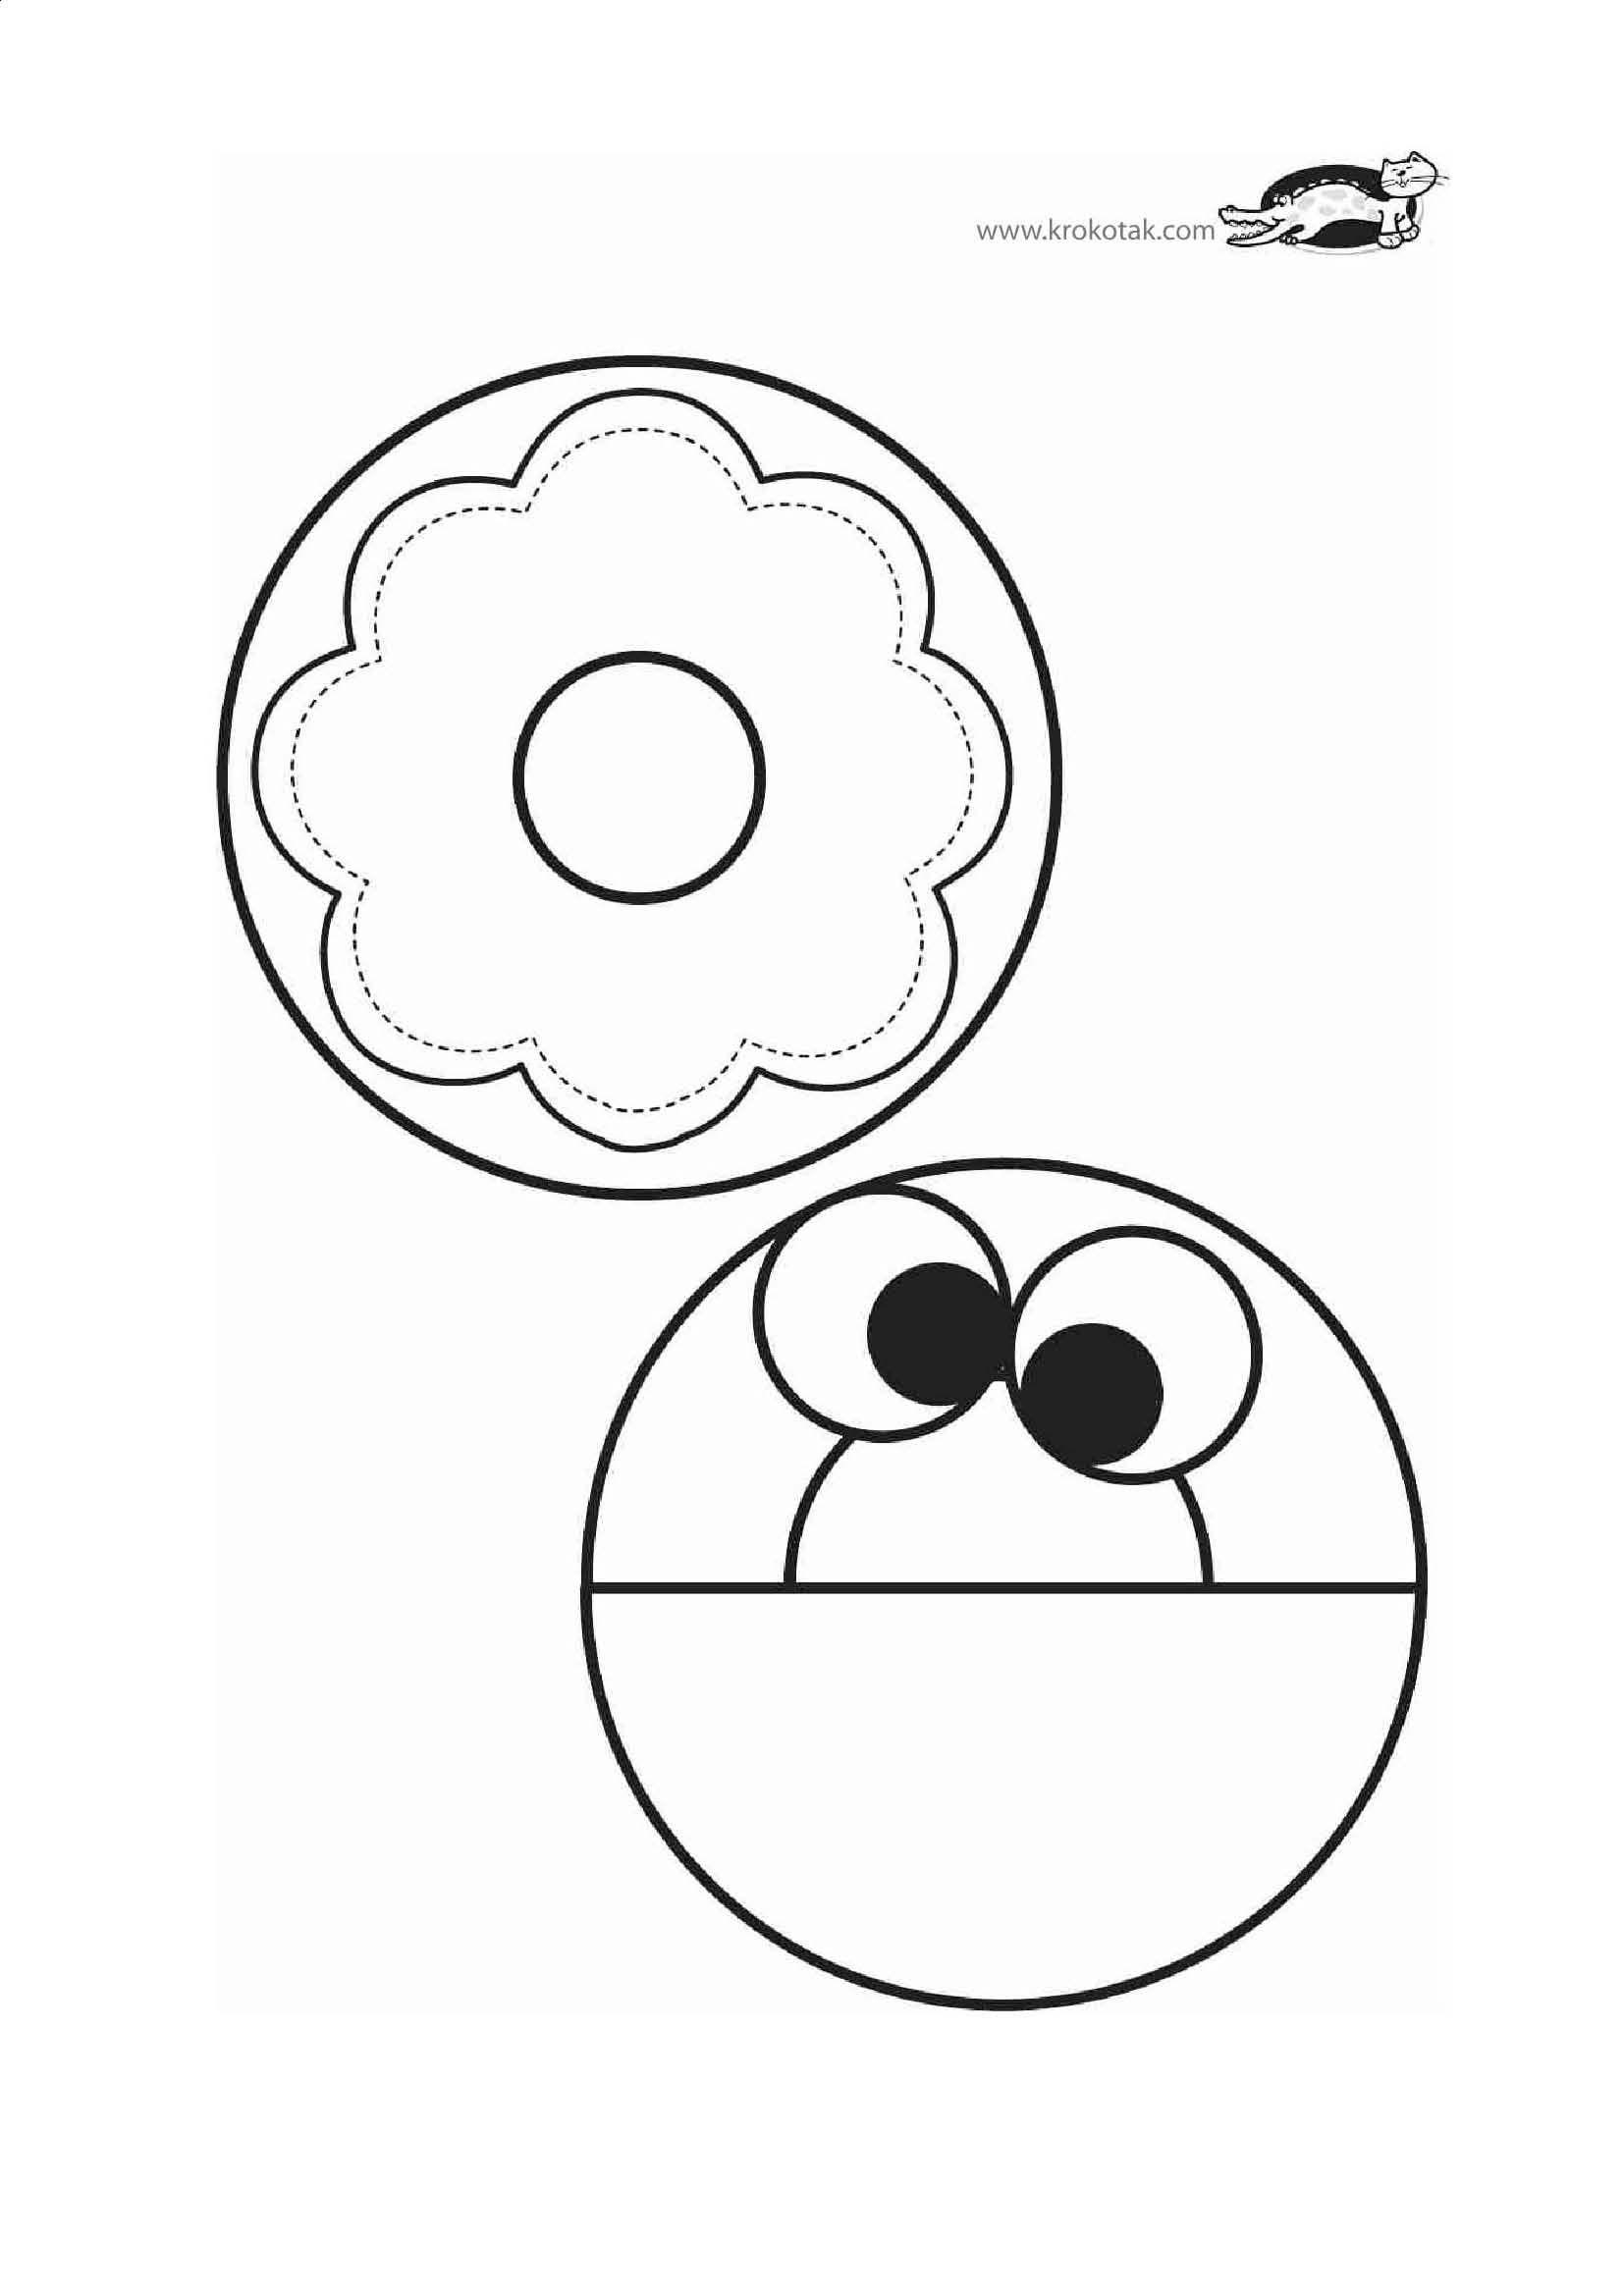 Pin By Mayta Masaganti On Sbk Old Cds Spring Crafts For Kids